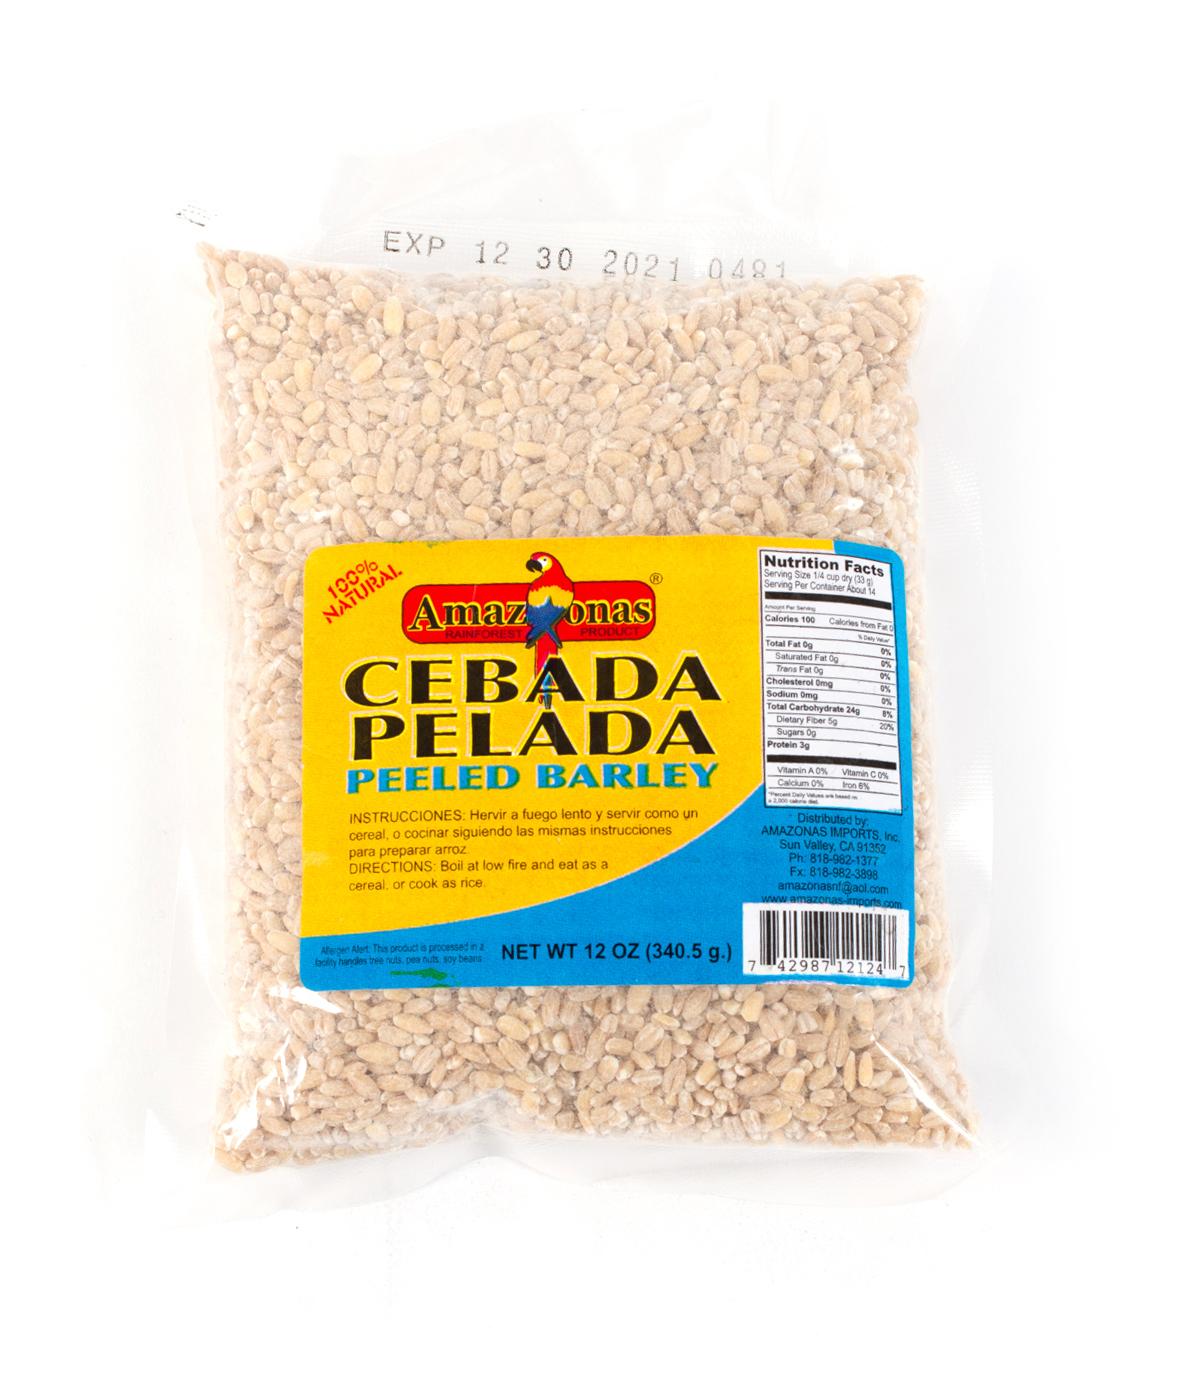 CEBADA PELADA